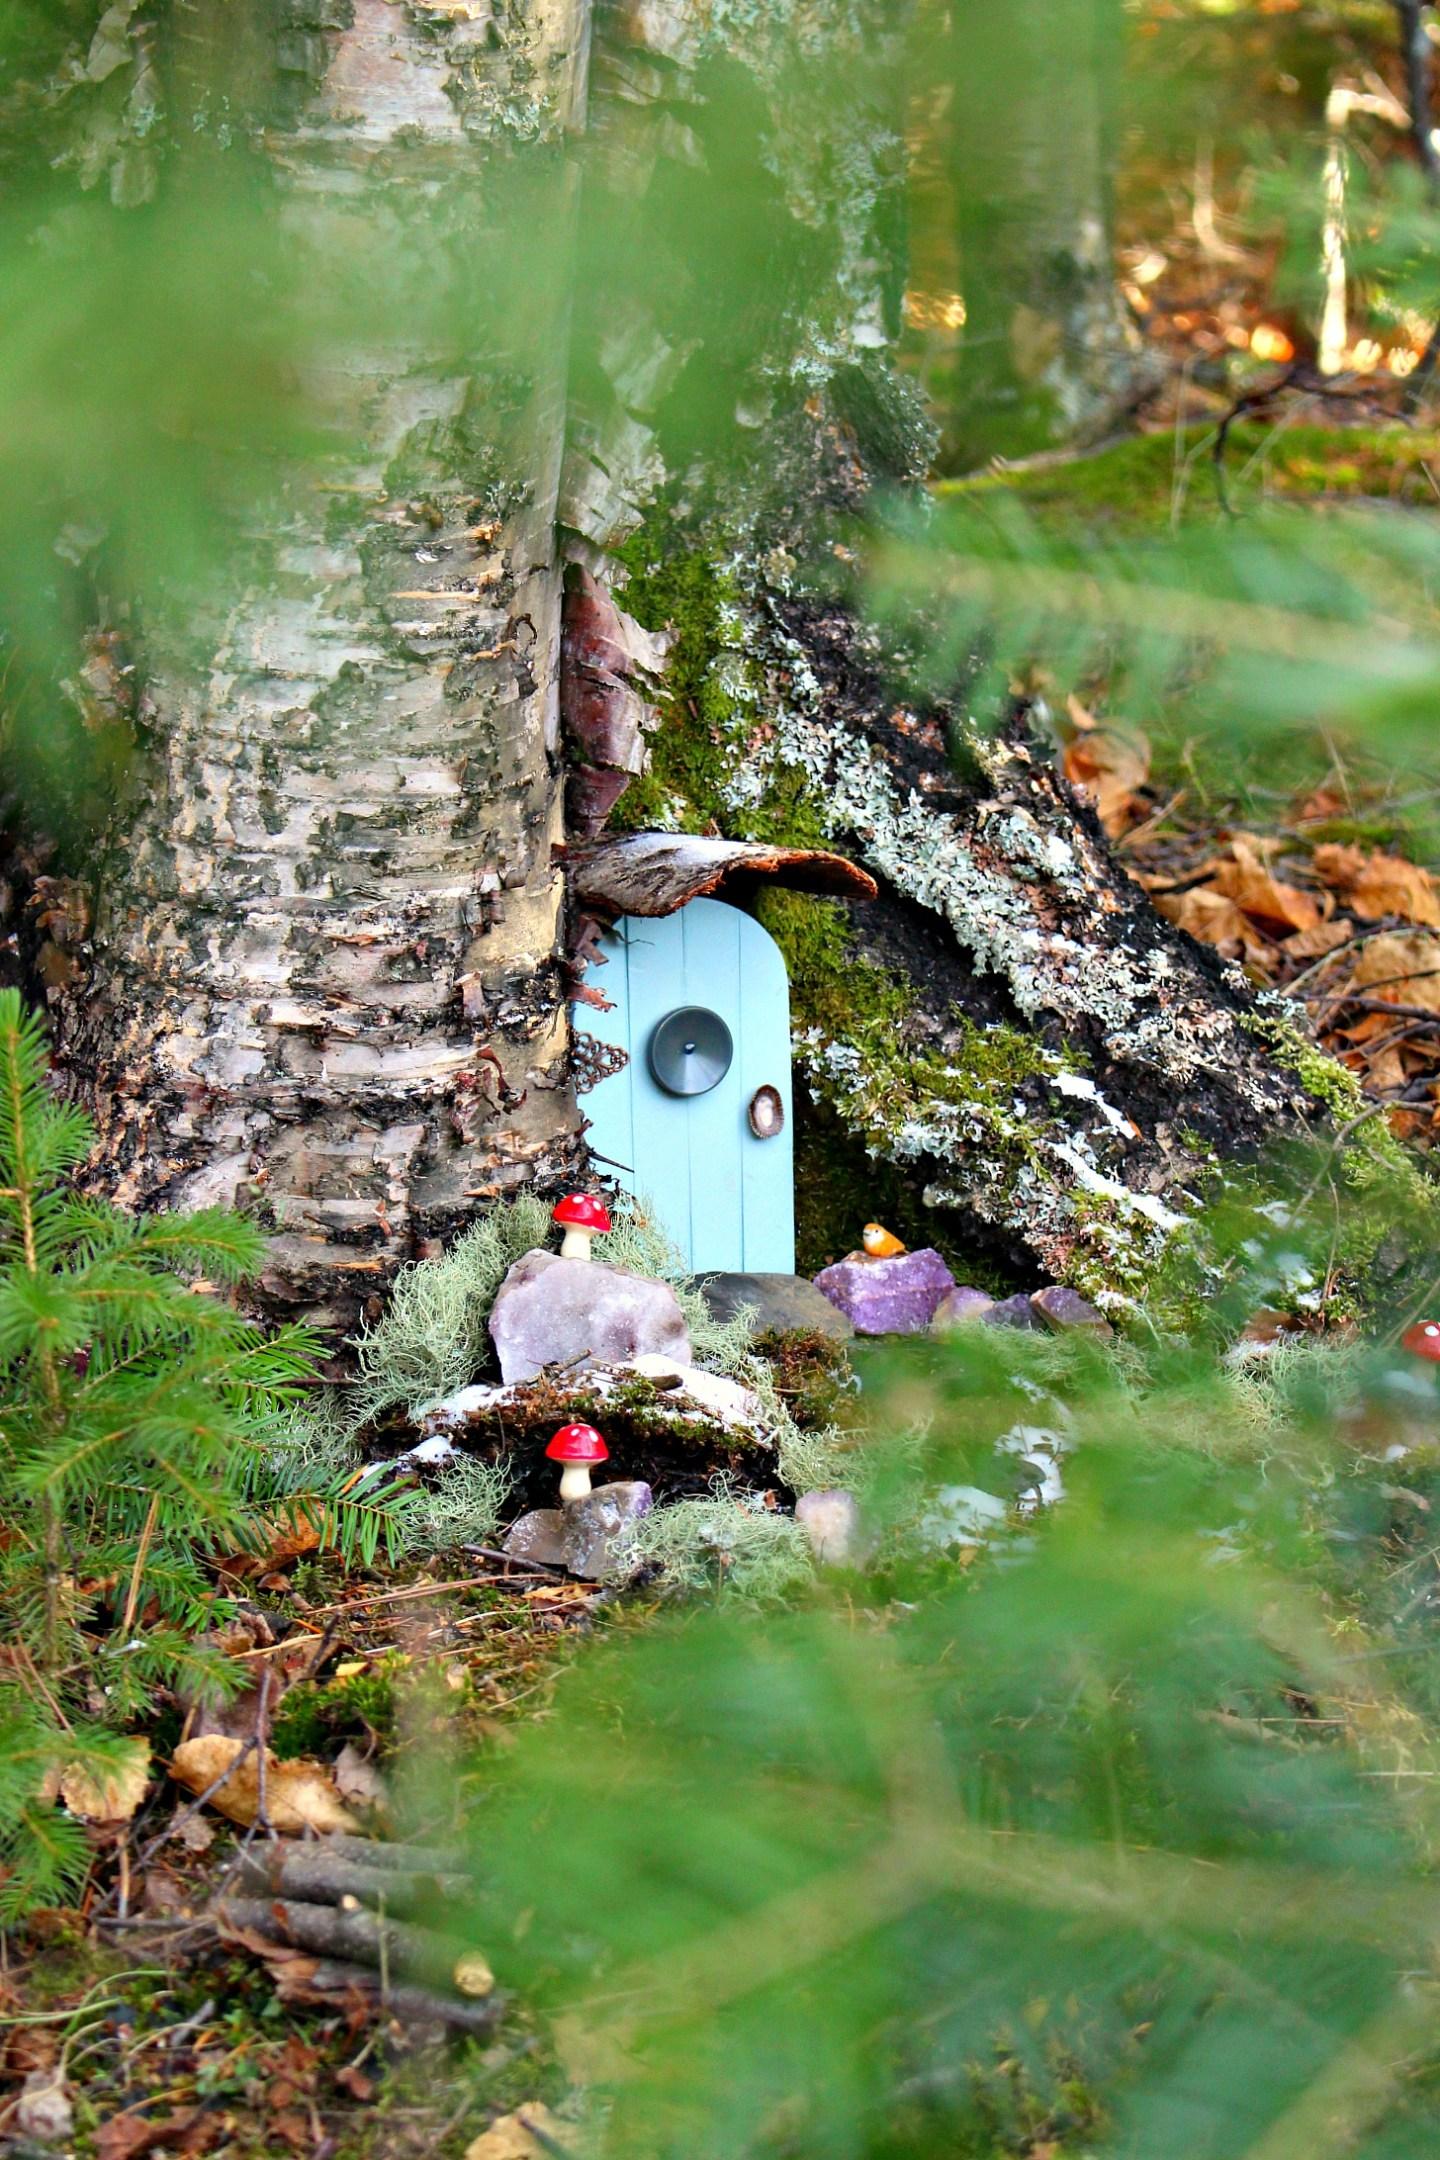 DIY Elf House on a Tree